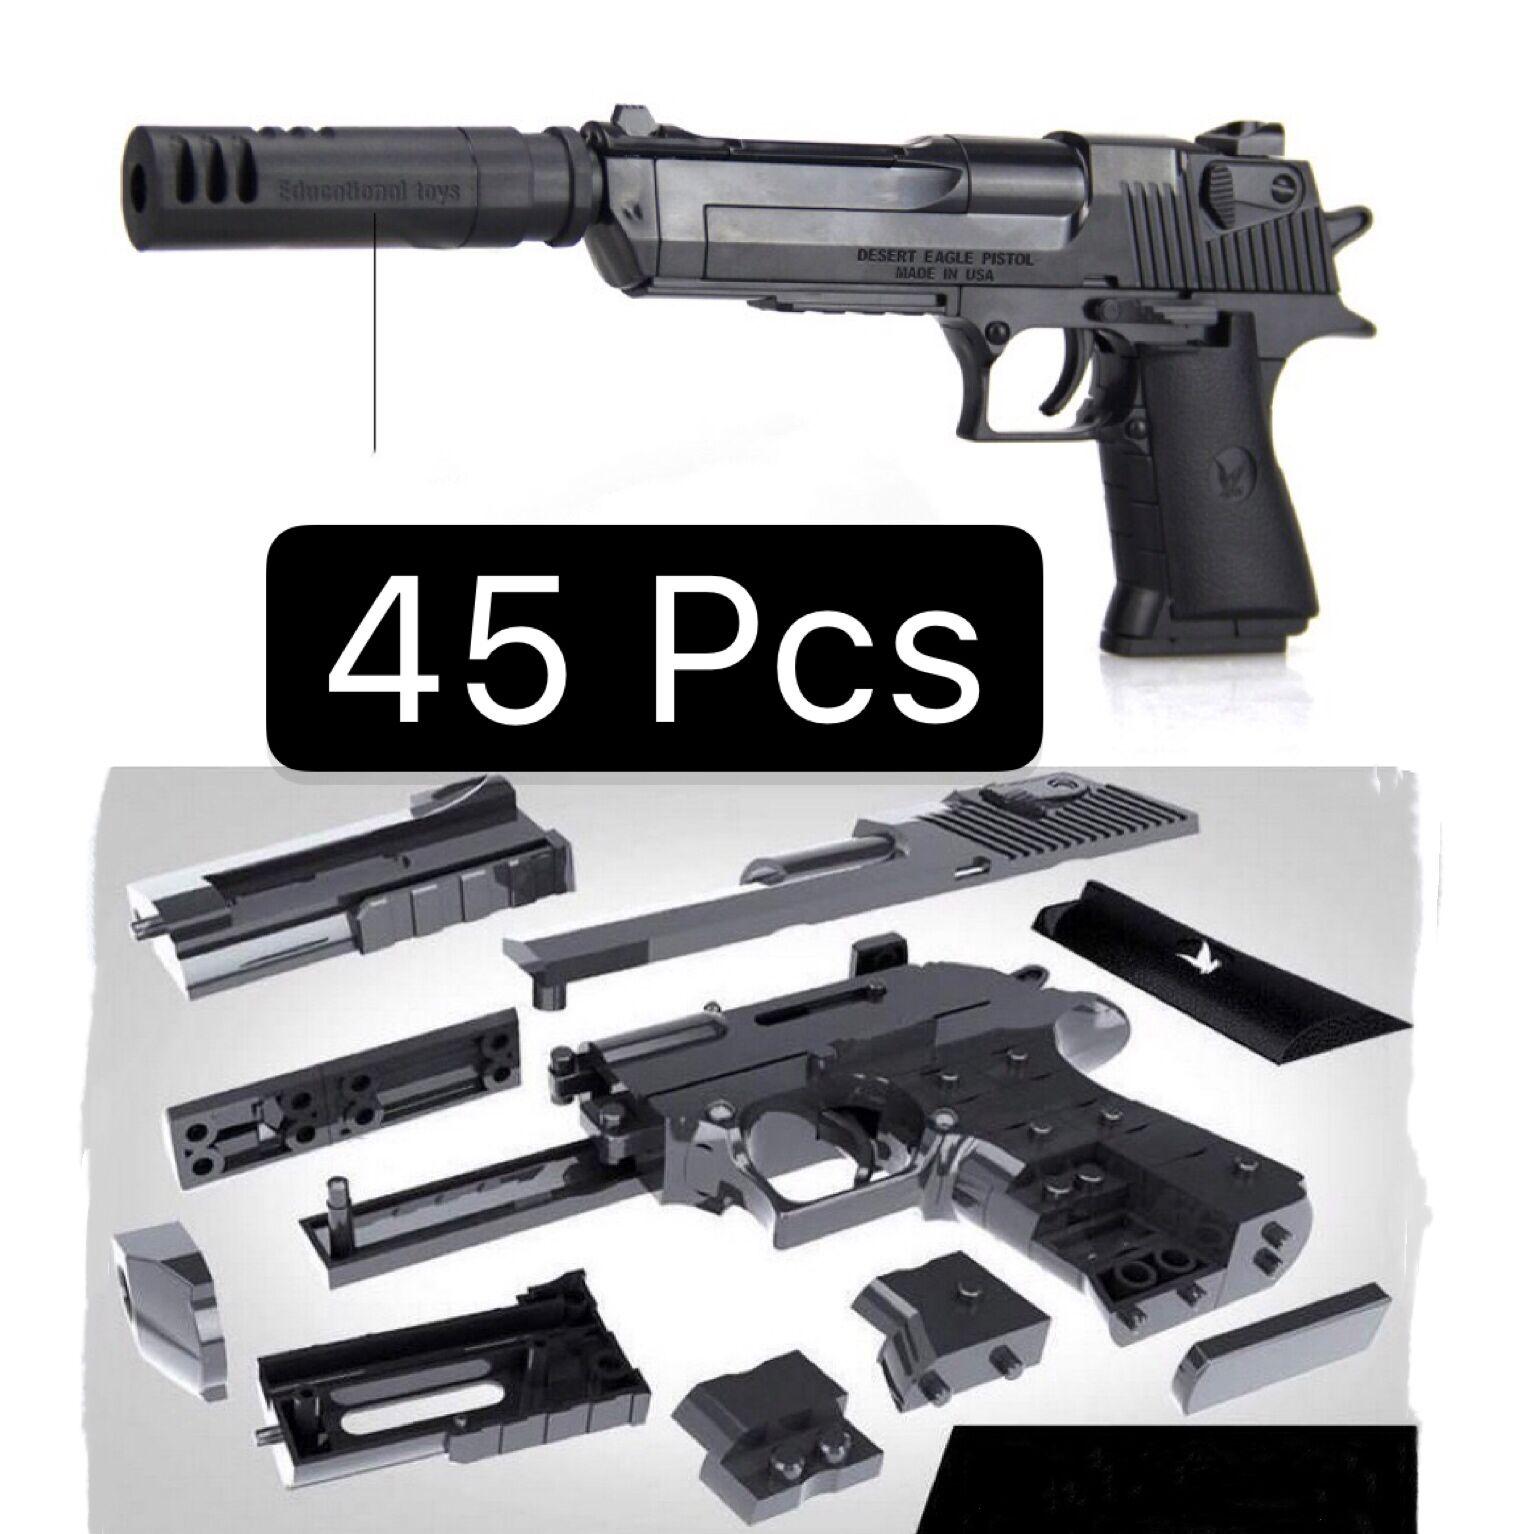 Boy Gun Model Kids DIY Rifle Assembled Building Block Toy Gun For Children Combination Pistol Military Arms Pistola Cool Gun Toy